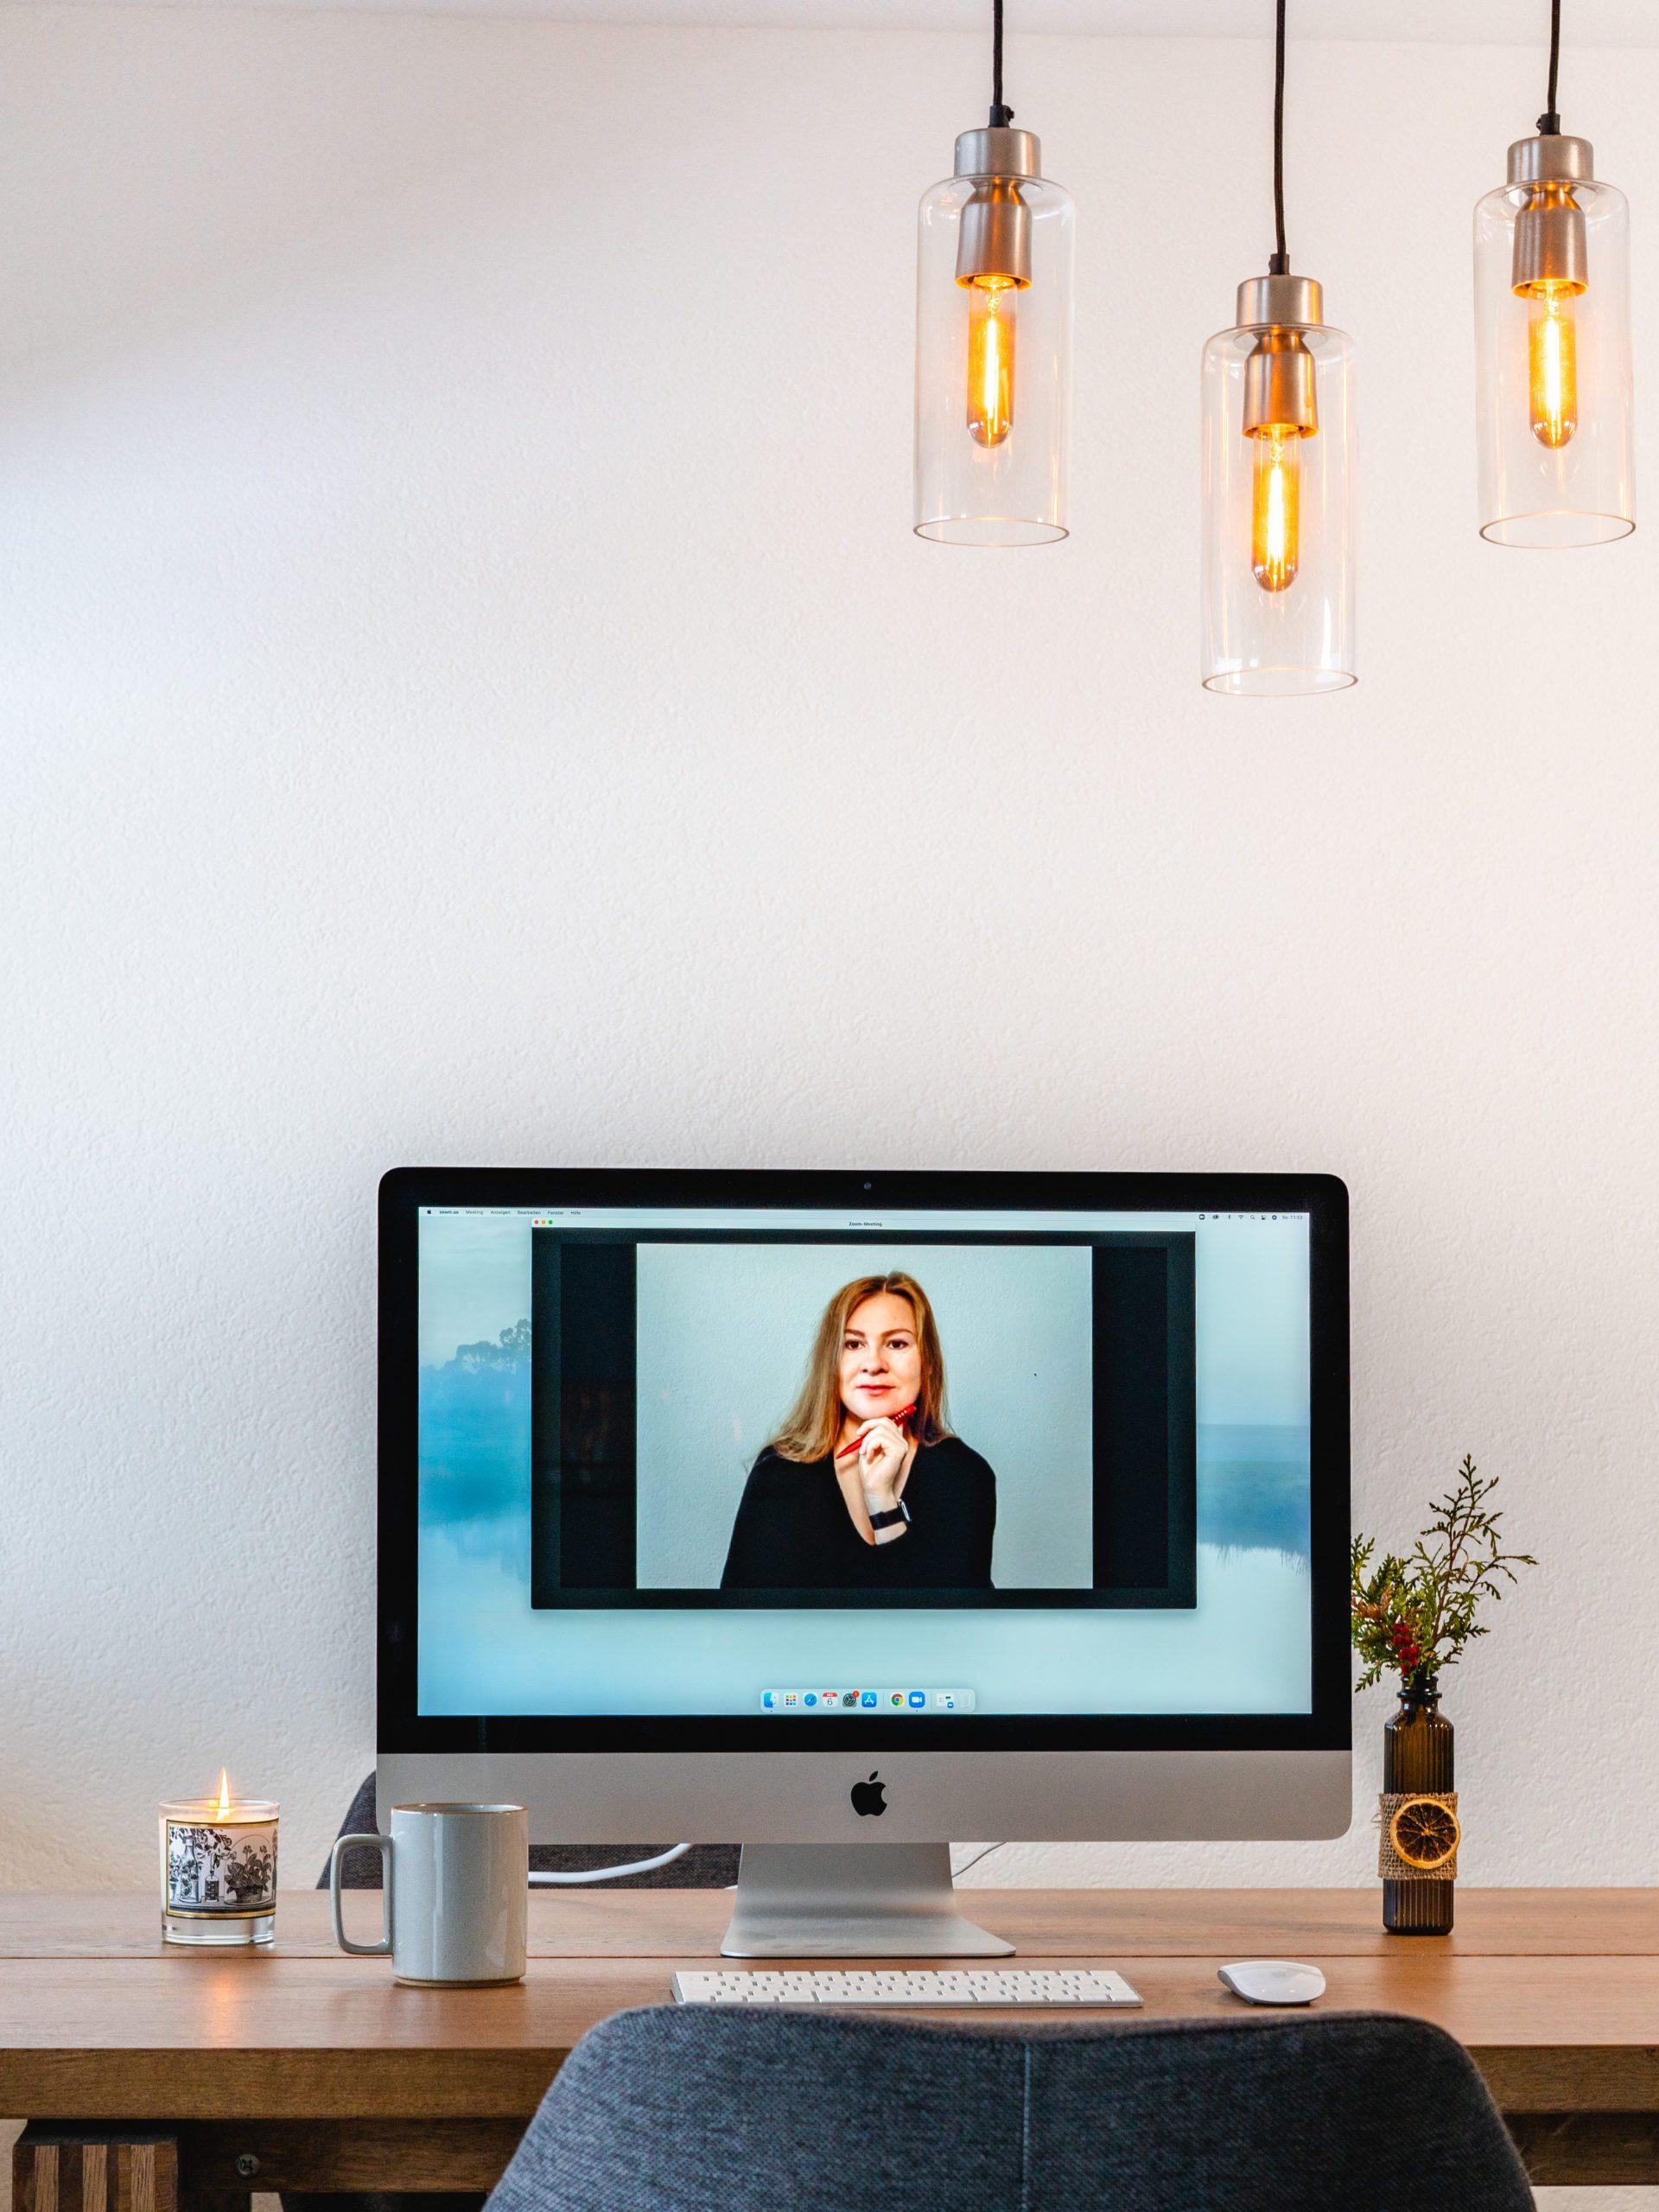 video conferencing hints avilavi blog